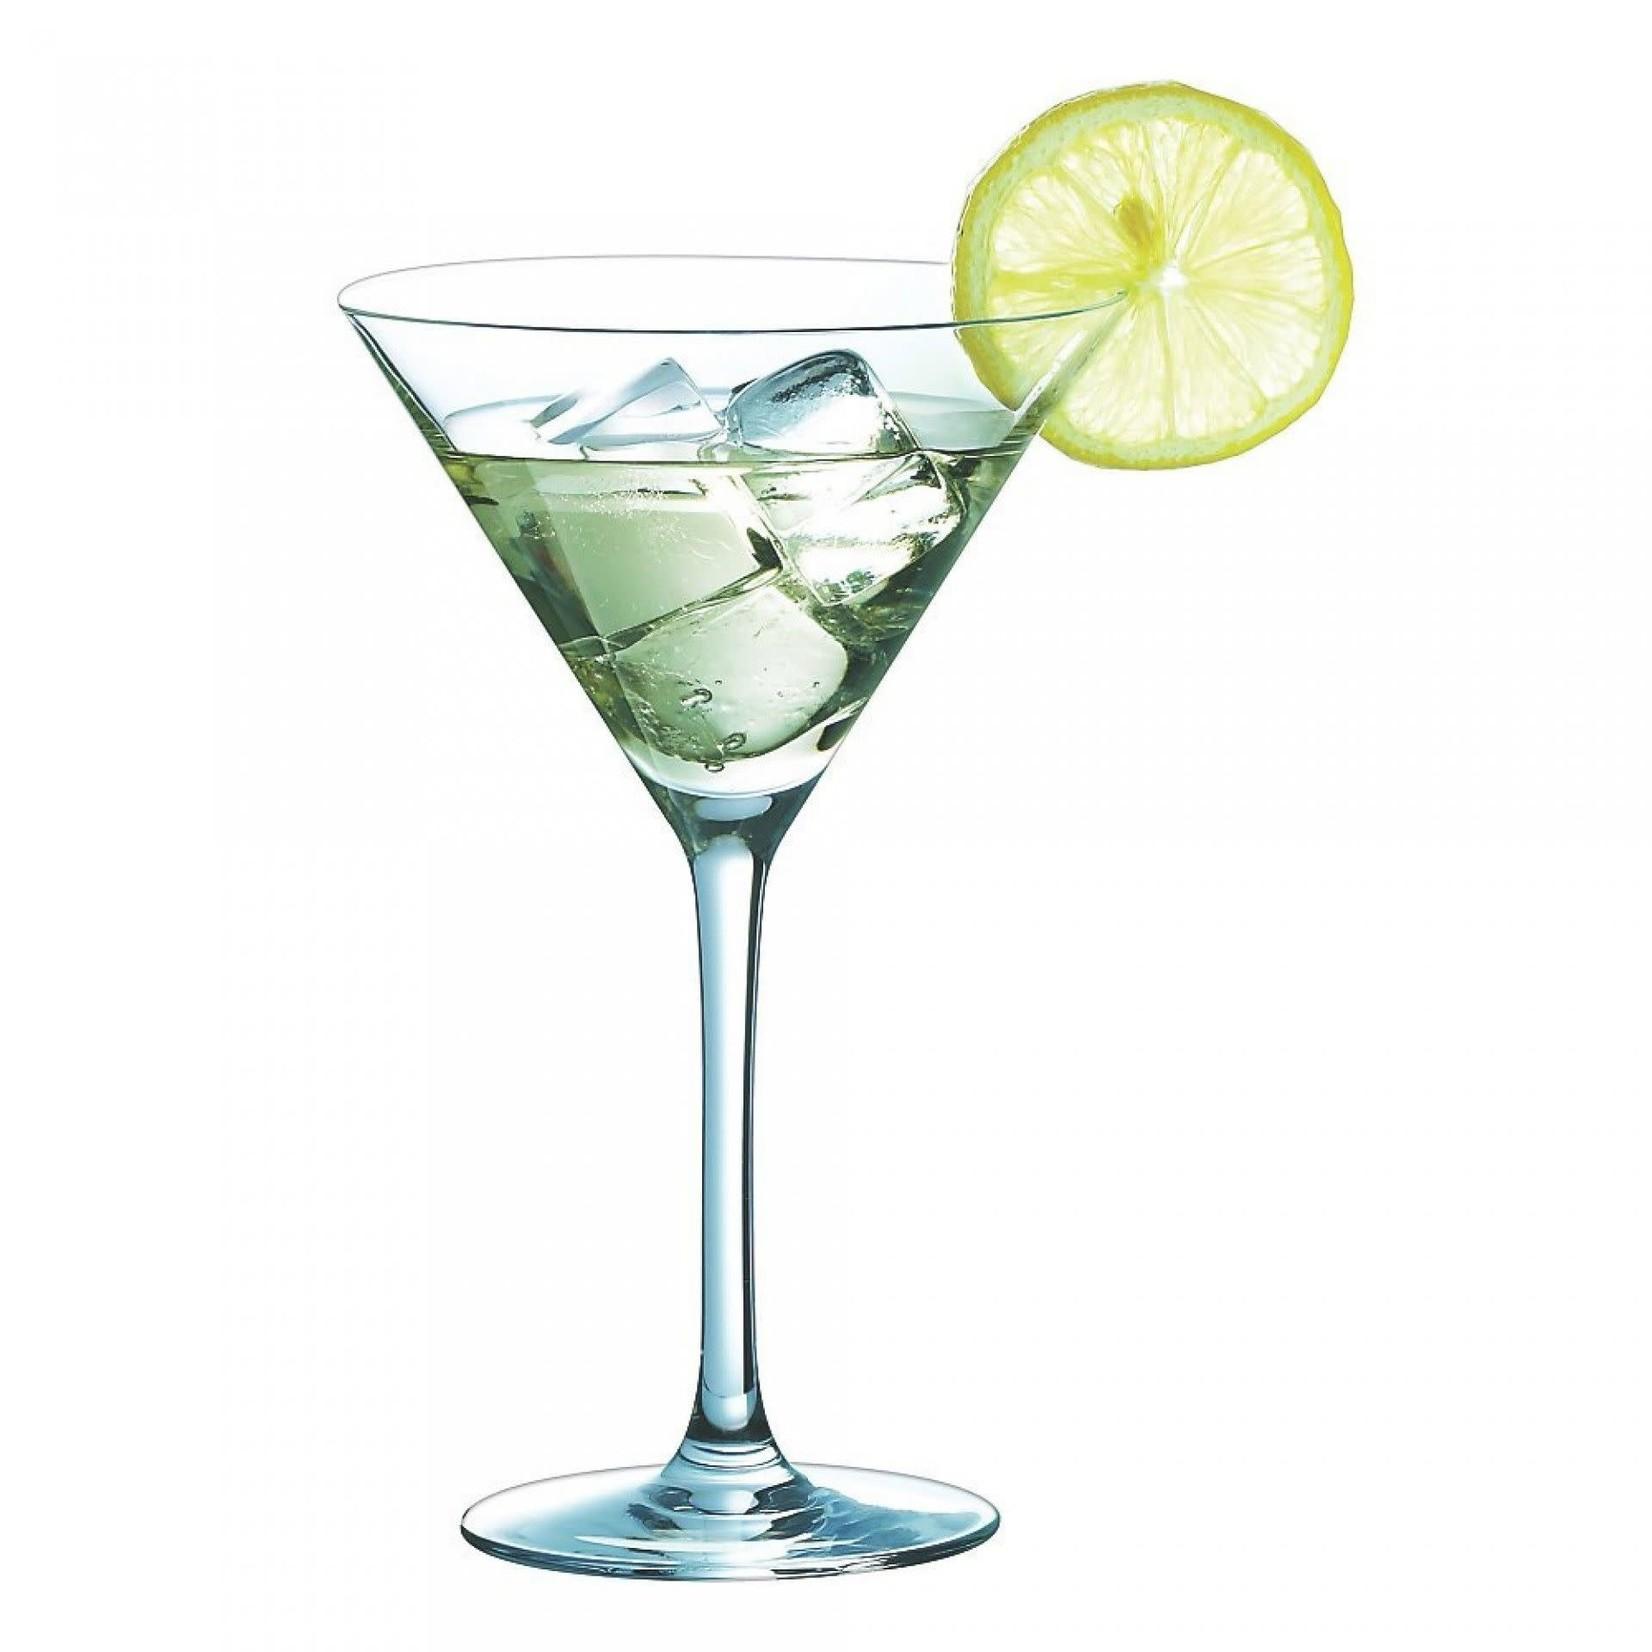 martiniglazen, 6 stuks